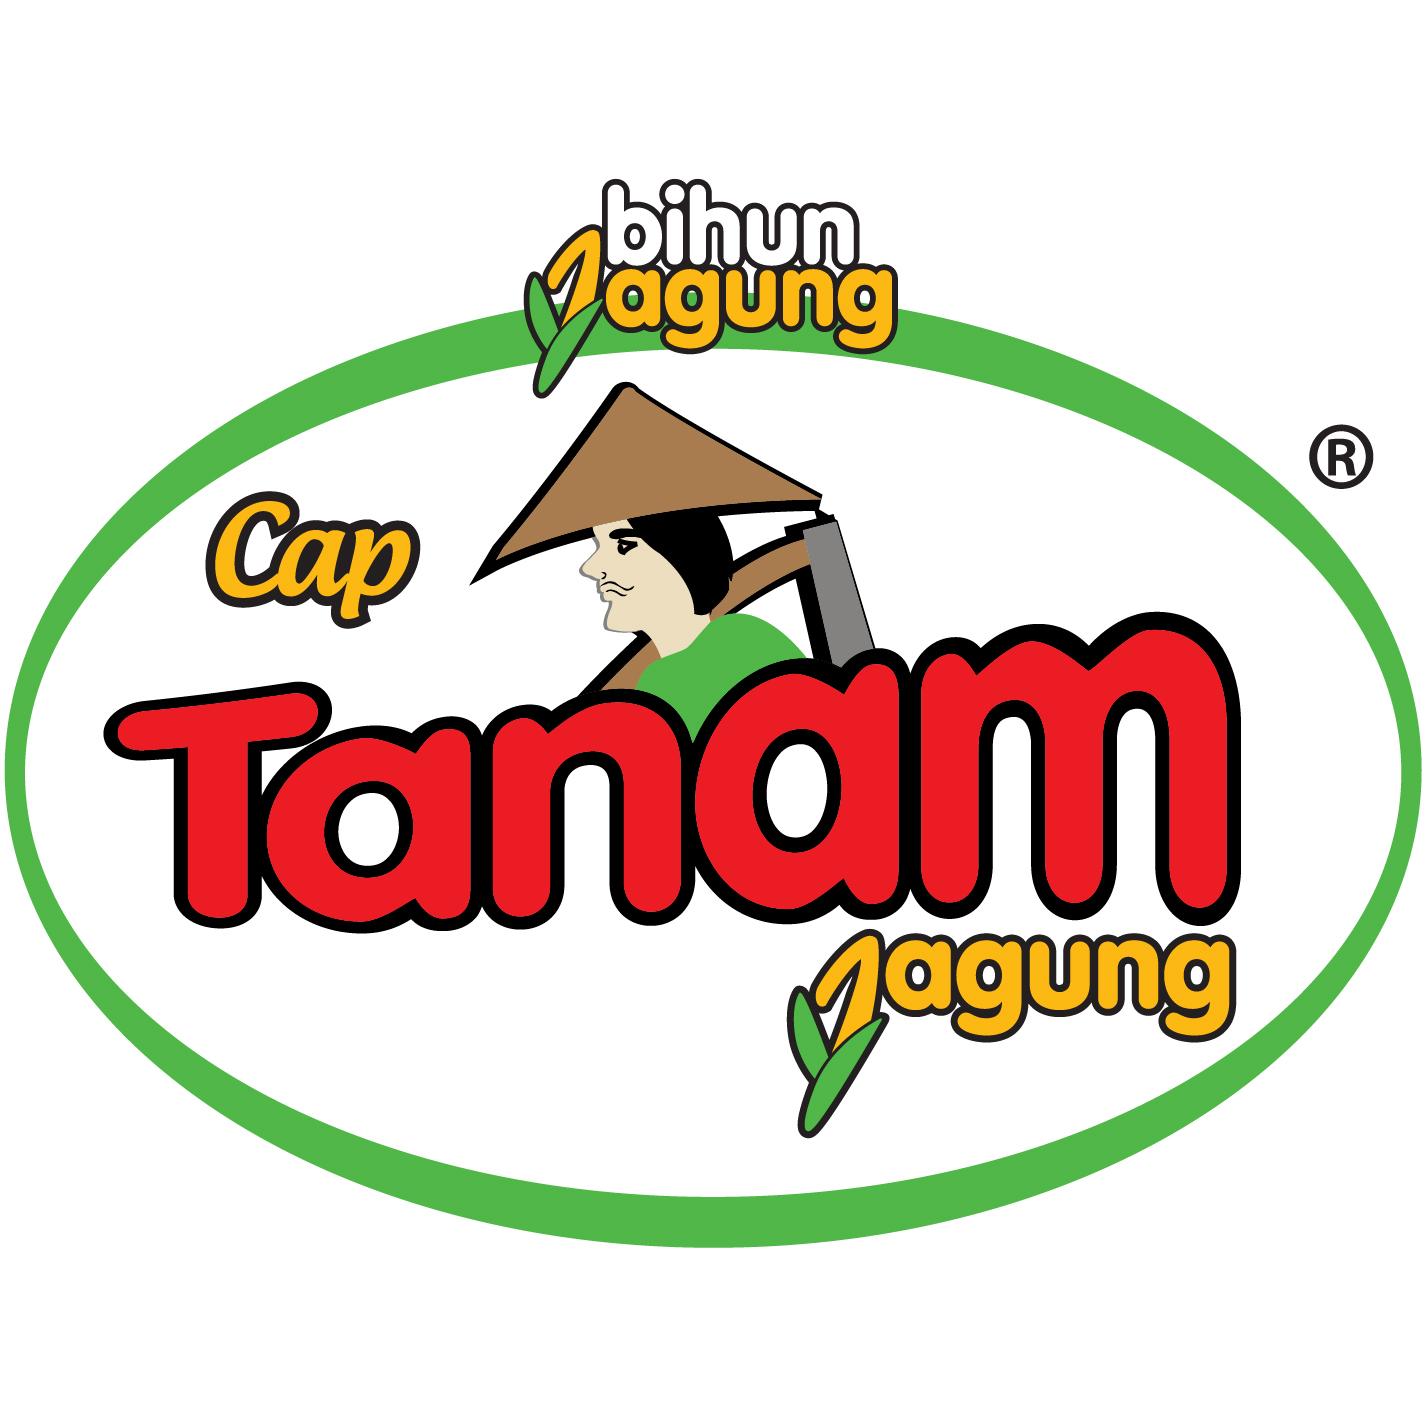 200428_FKS Group_FKS Mart_Banner official store_Logo Cap Tanam Jagung